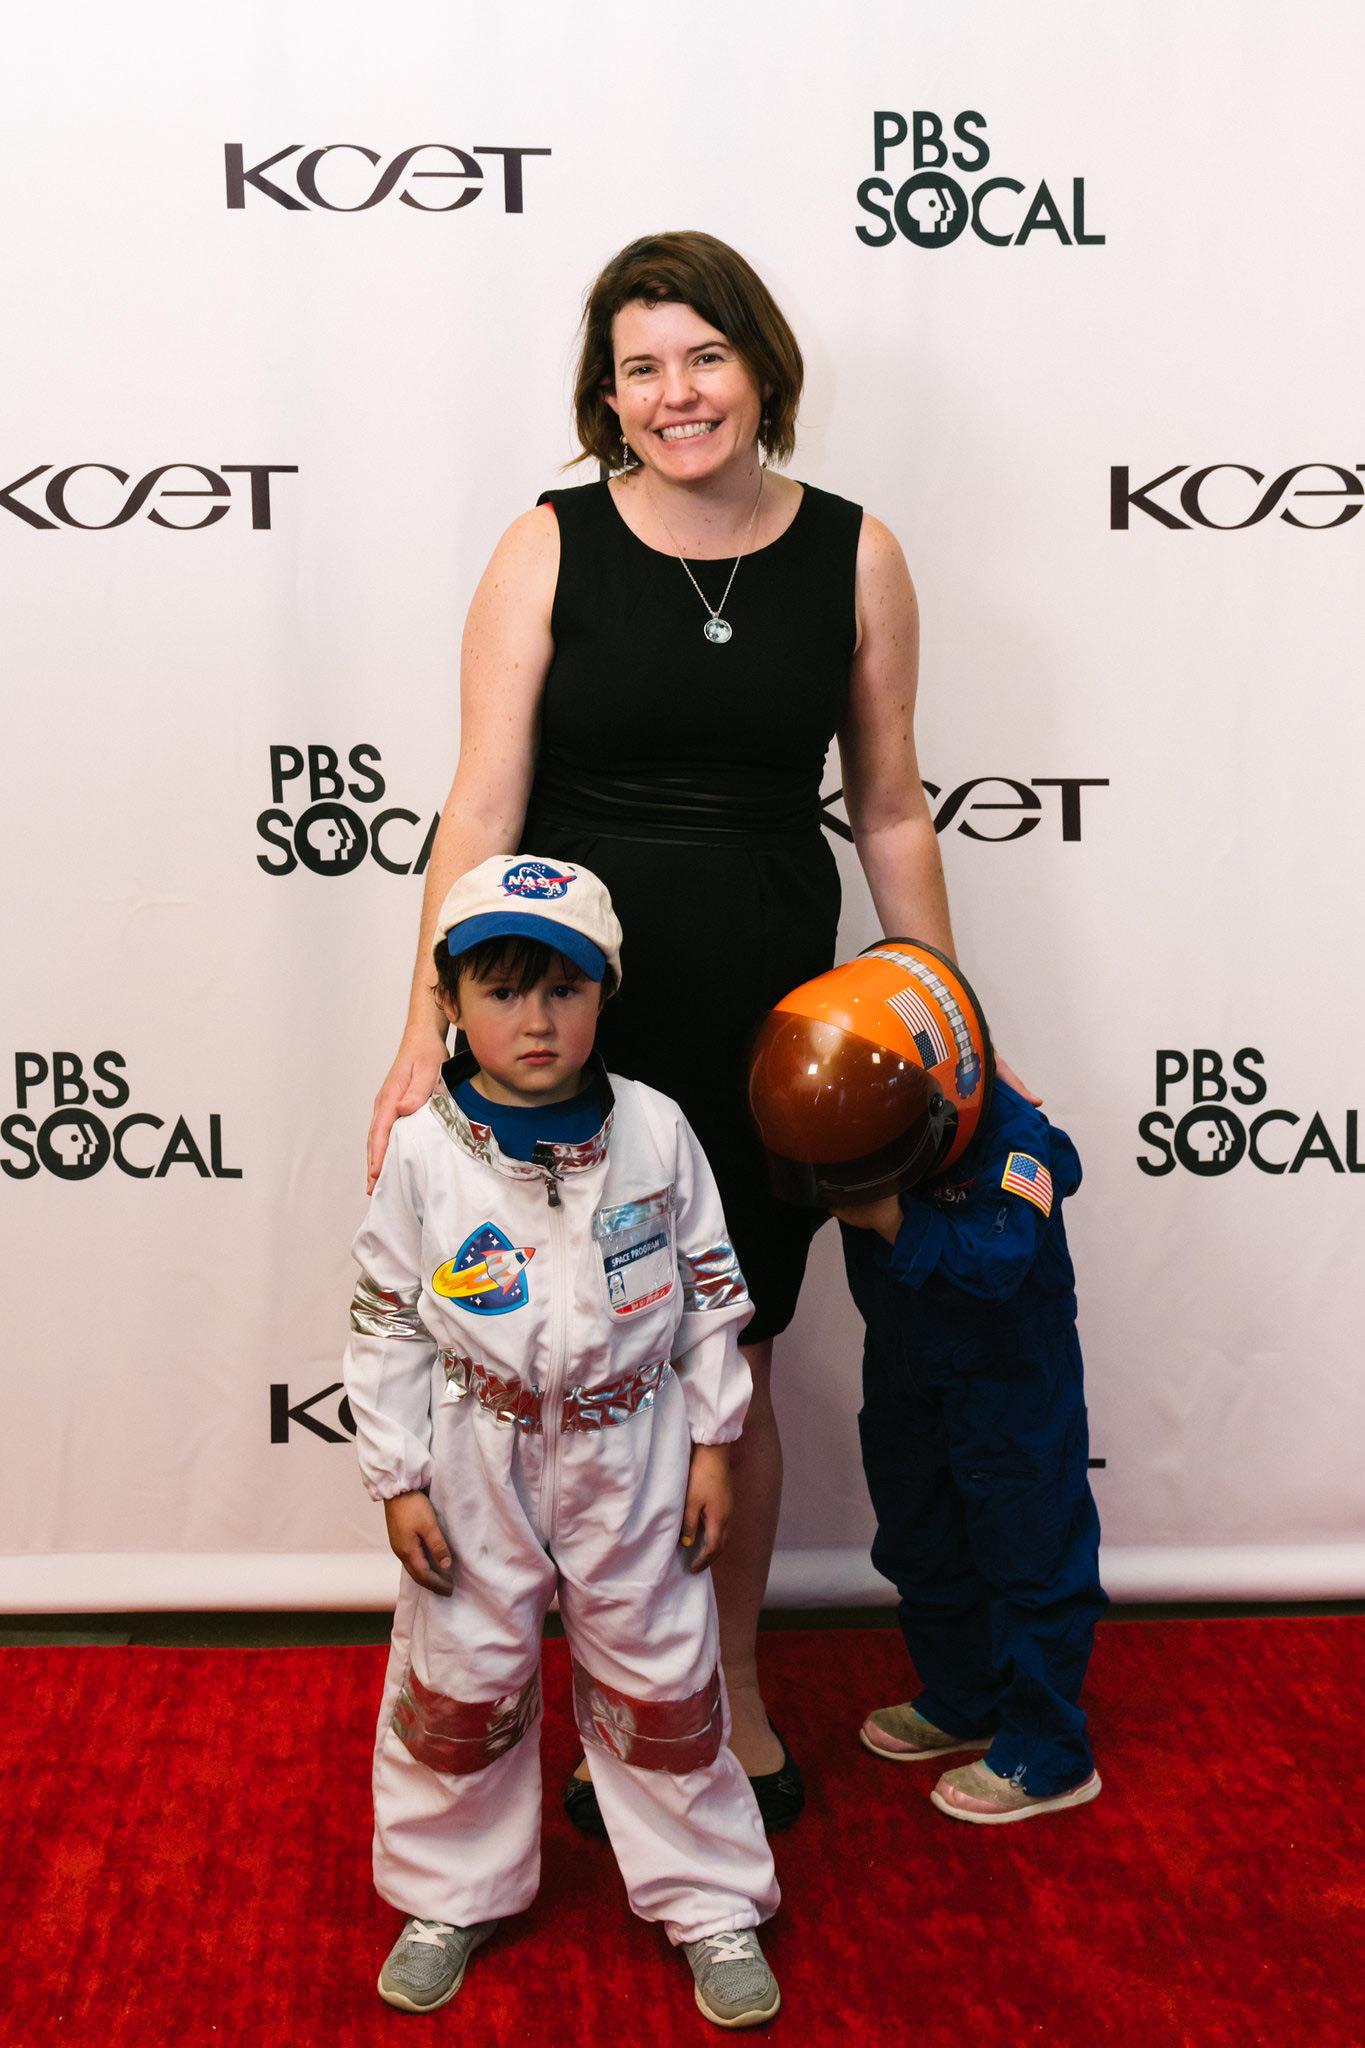 Astrophysicist and Winner of the 2018 NASA Exceptional Achievement Medal Dr. Jessie Christiansen with her children